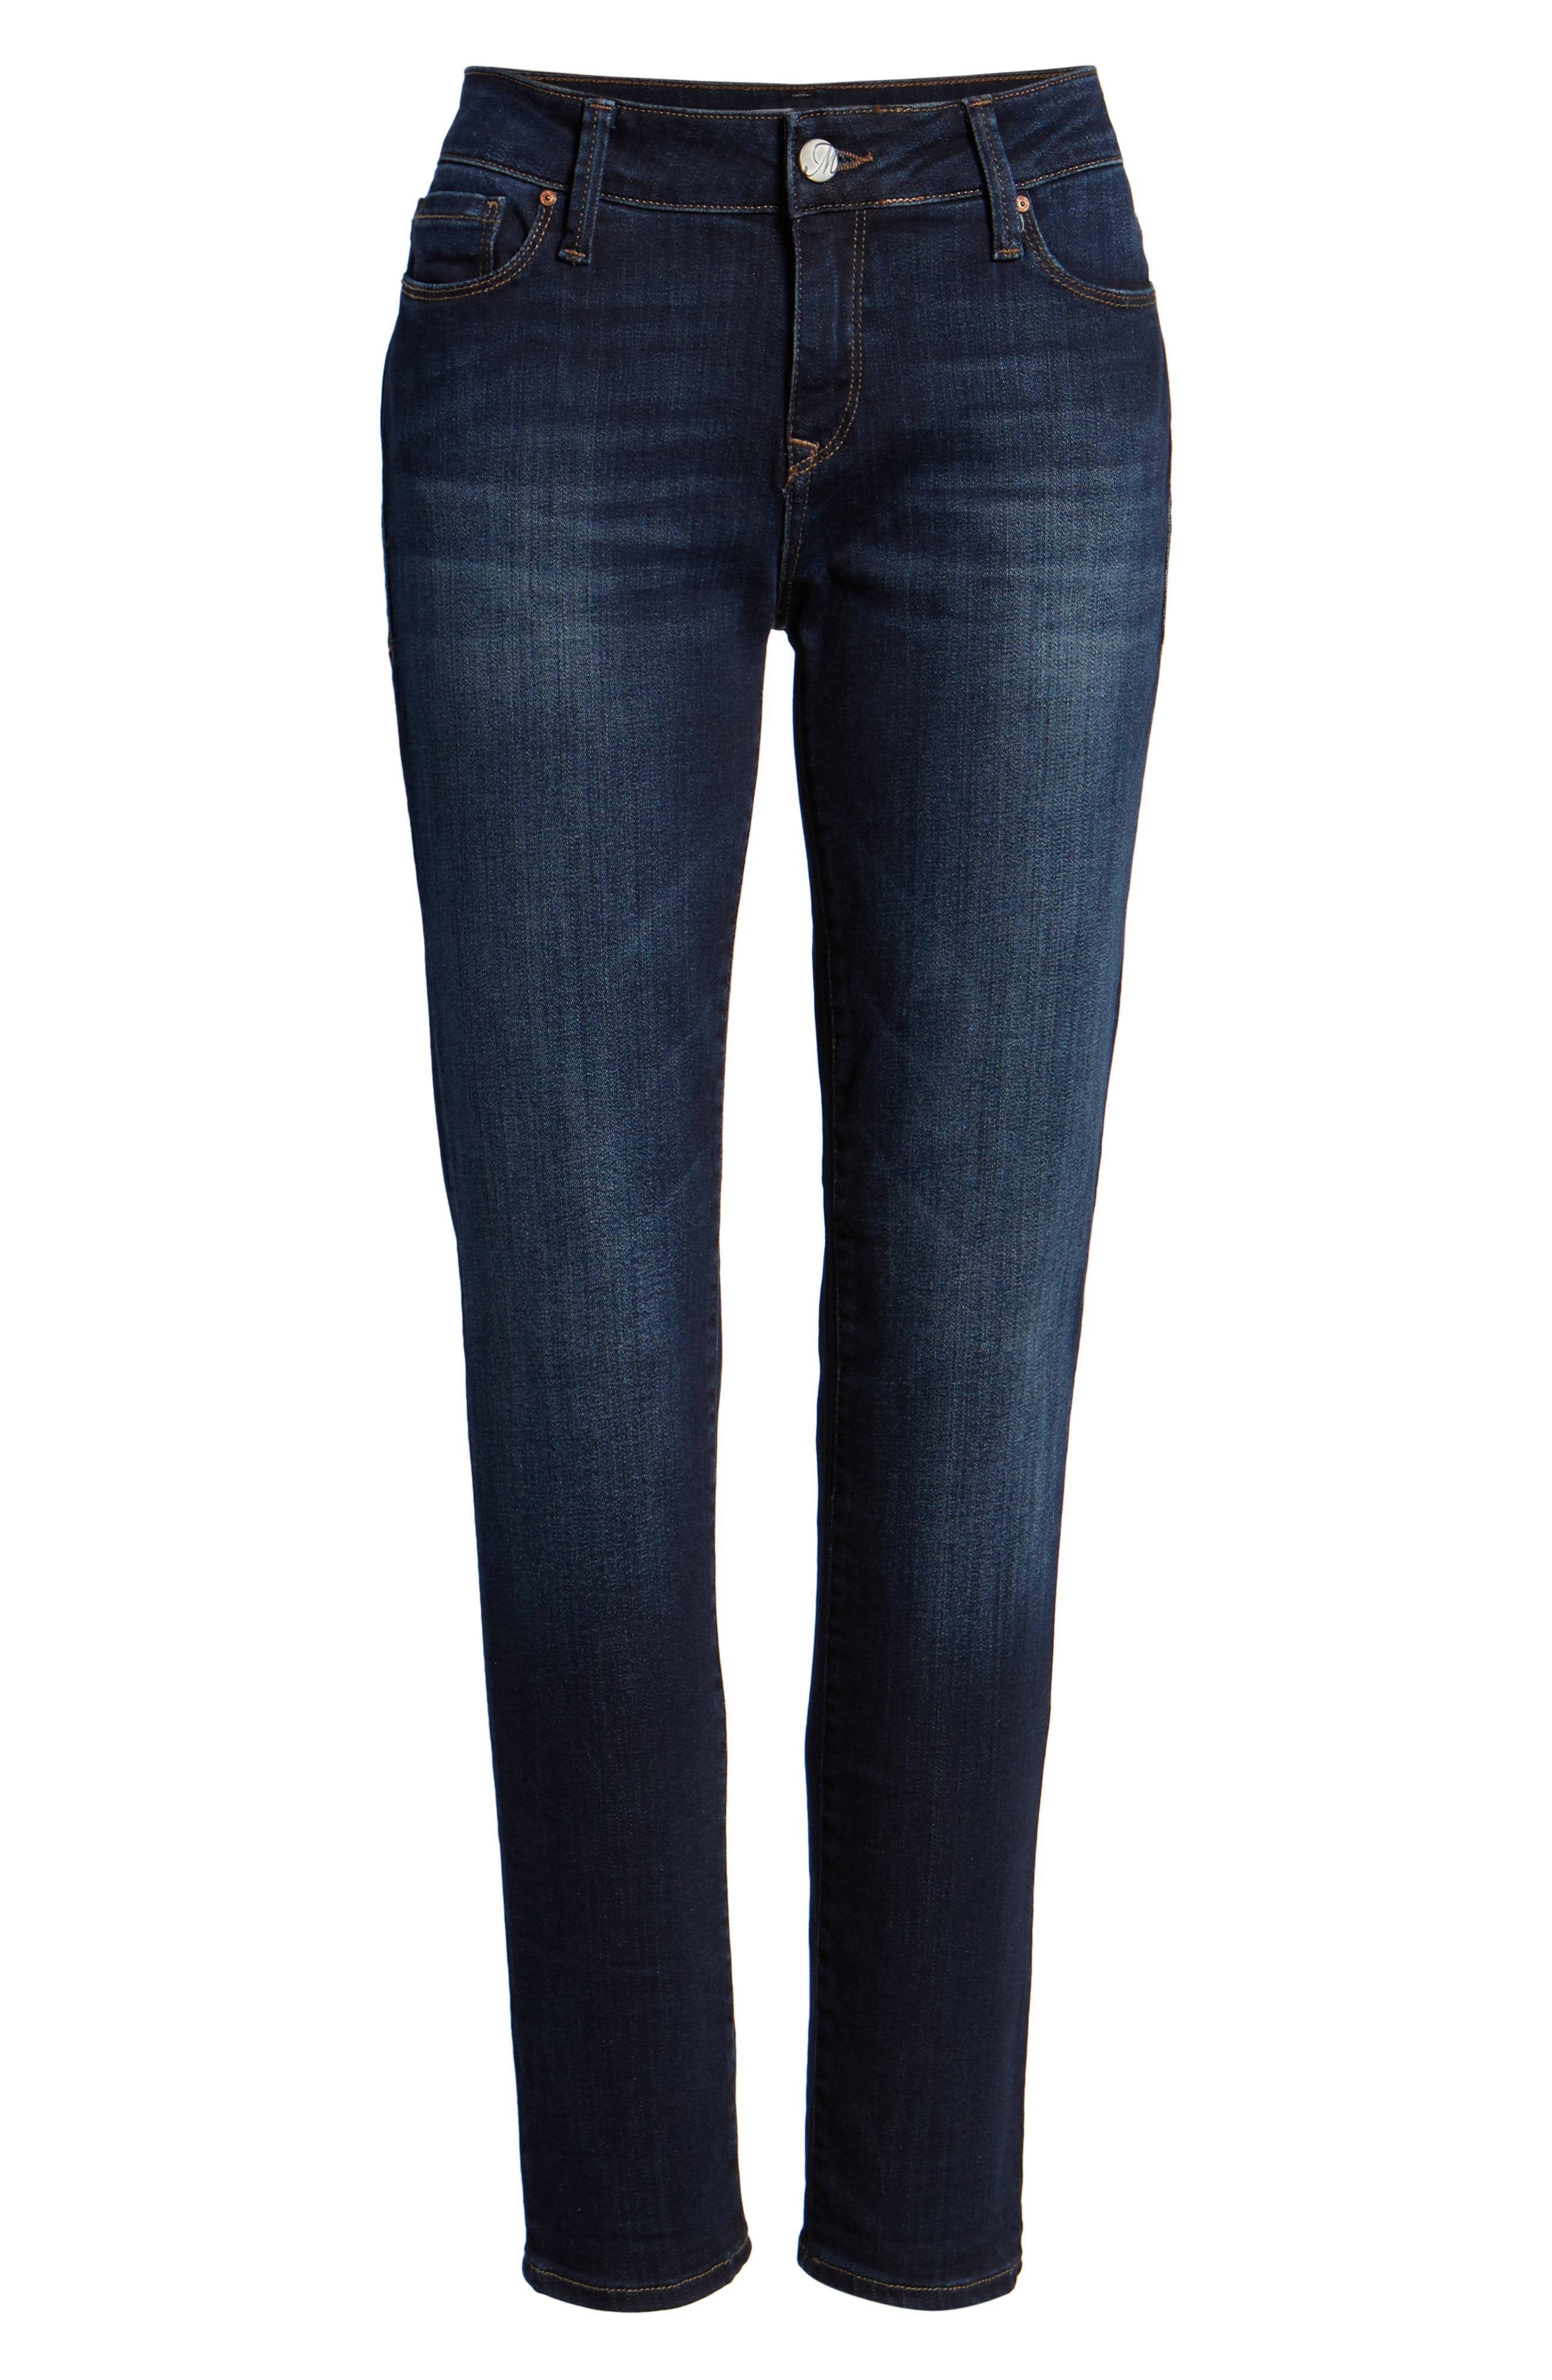 Ada Boyfriend Jeans,                             Alternate thumbnail 7, color,                             INDIGO BRUSHED